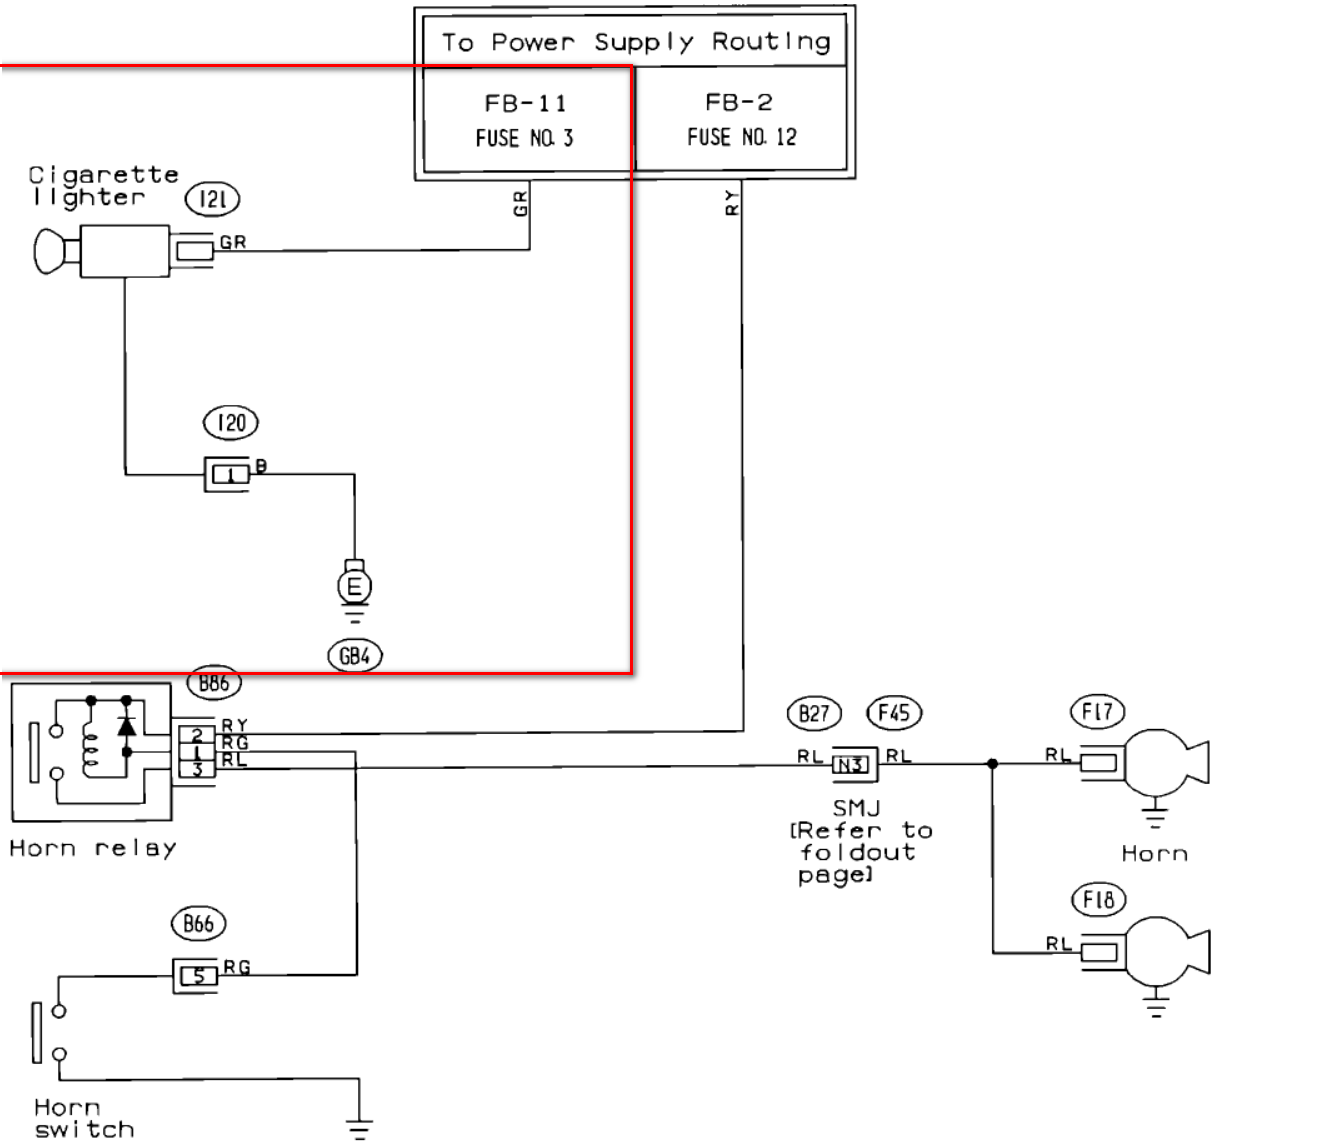 car cigarette lighter wiring diagram trusted wiring diagrams basic electrical  wiring diagrams car cigarette lighter adapter